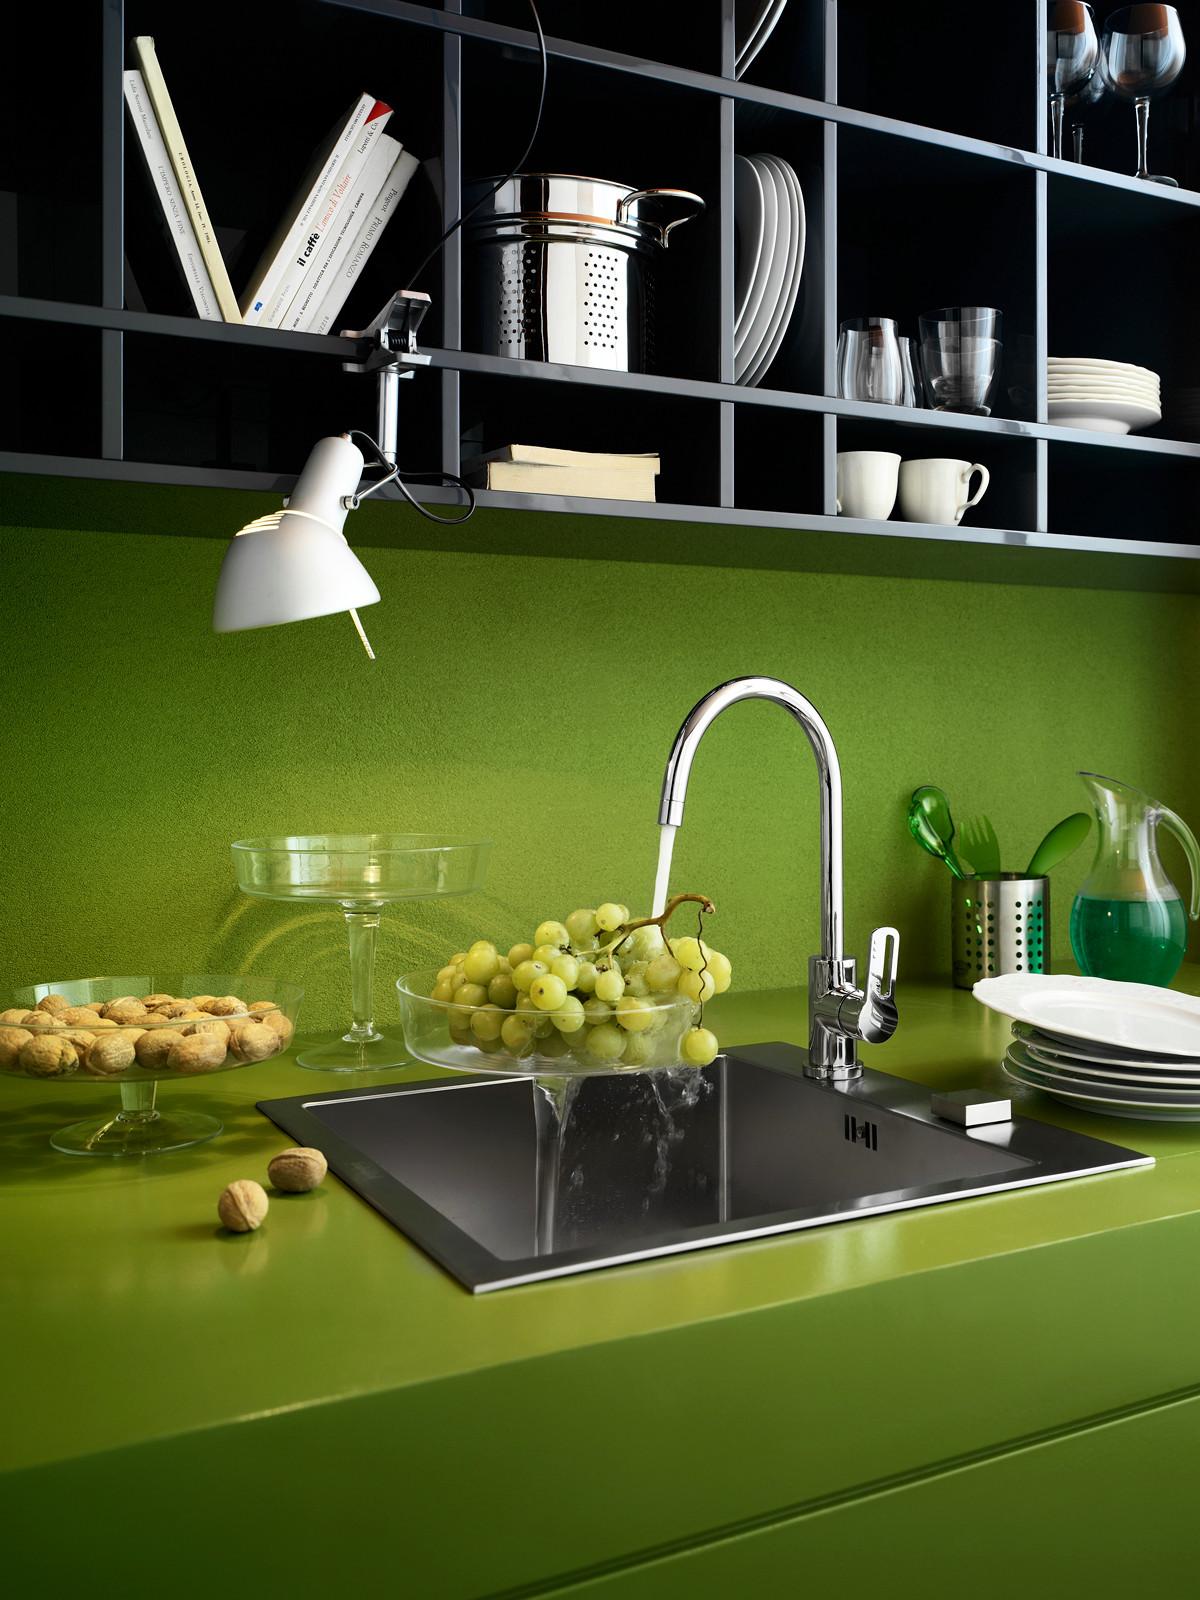 nobili rubinetterie cucina - 28 images - emejing rubinetteria cucina ...